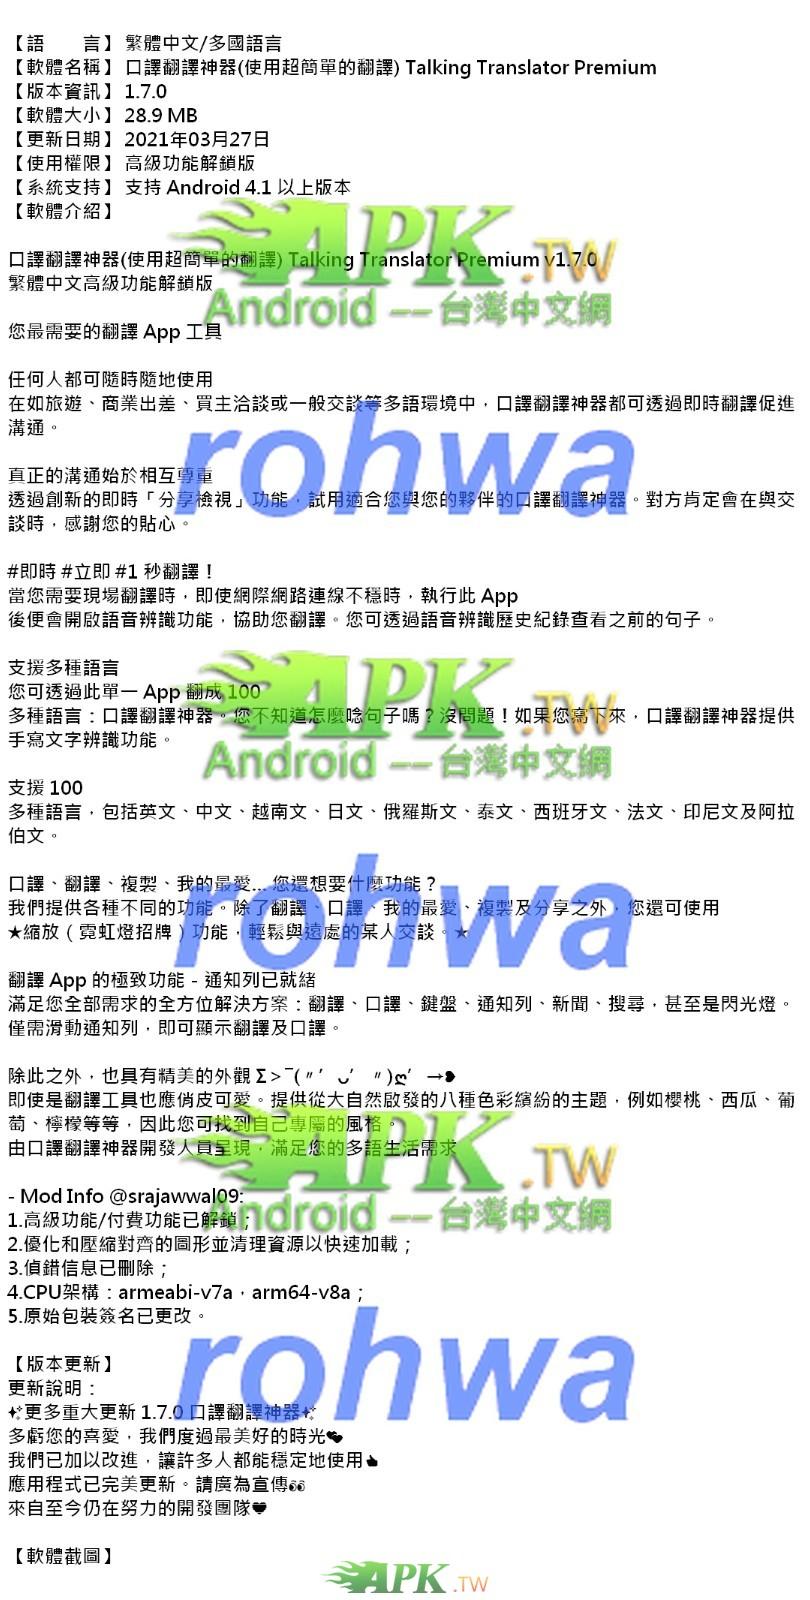 TalkingTranslator_Premium_1.7.0_.jpg